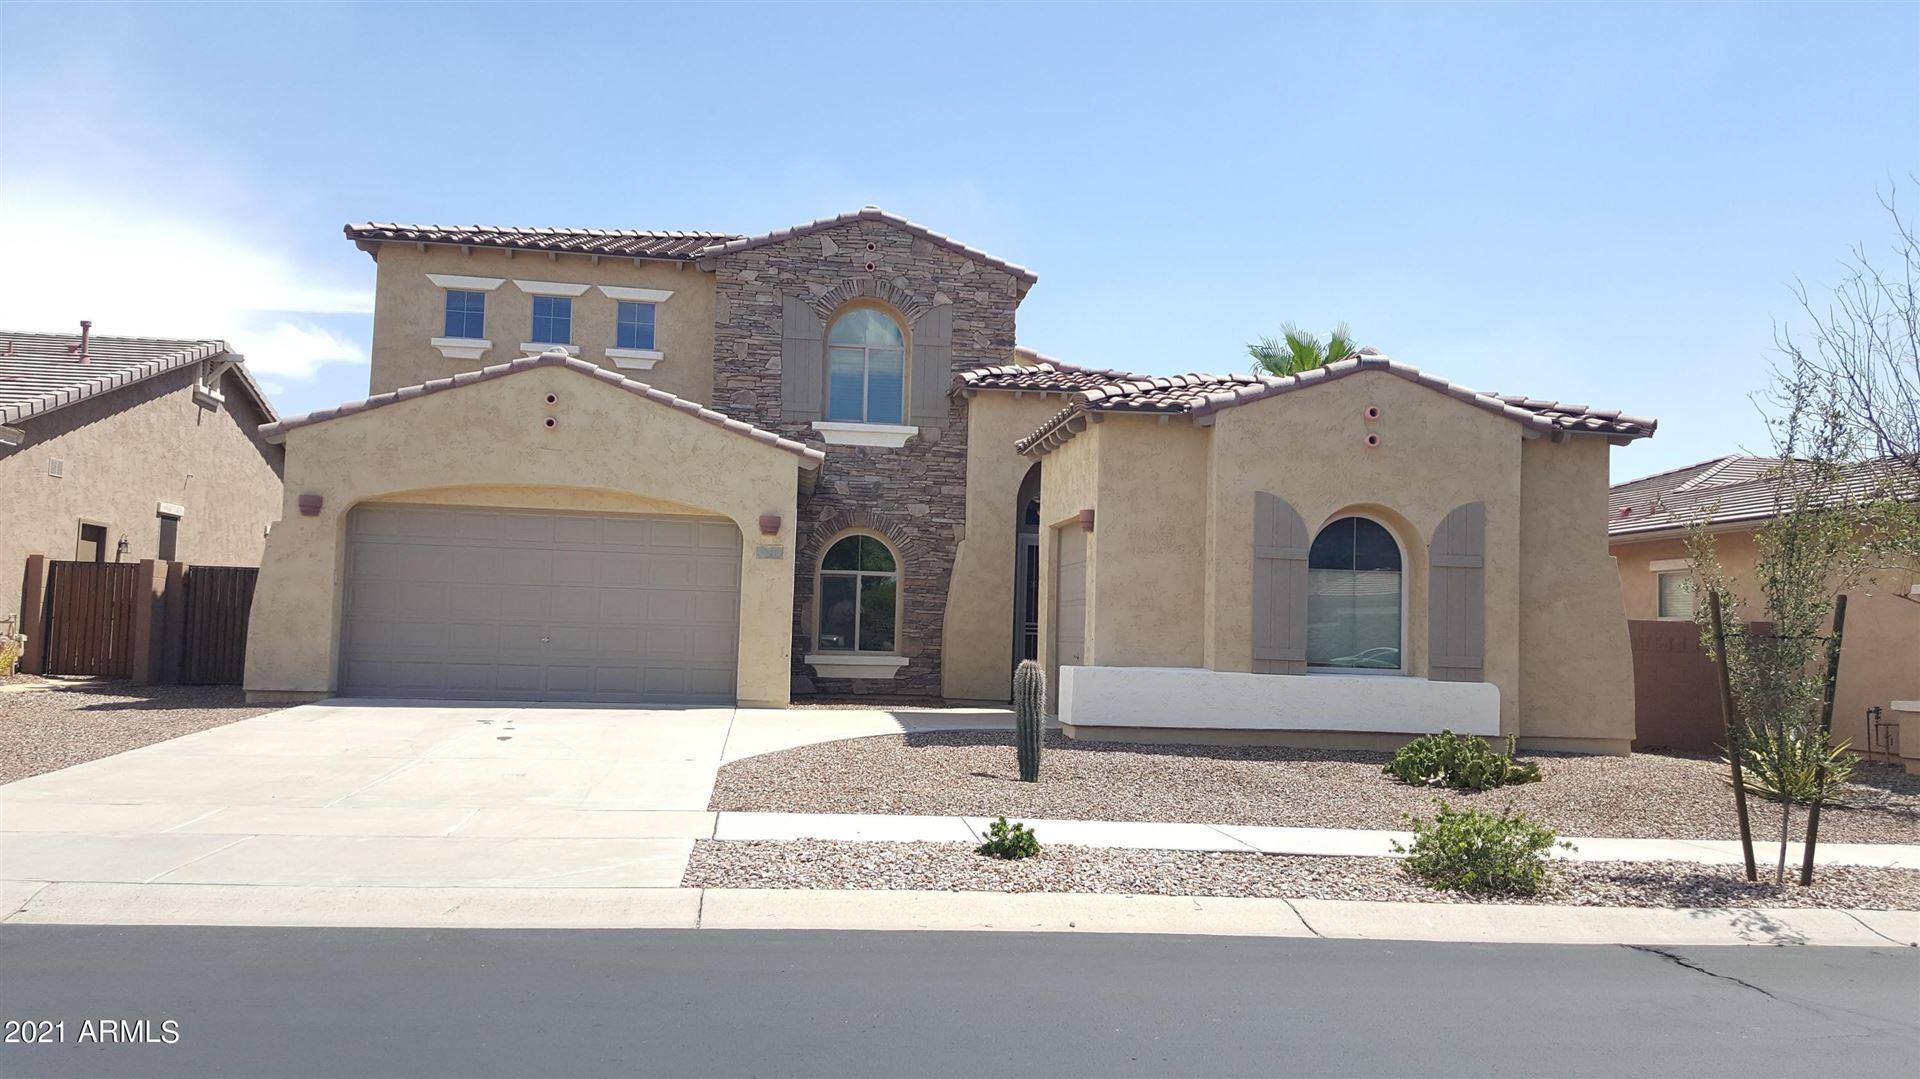 Photo of 773 E TORREY PINES Place, Chandler, AZ 85249 (MLS # 6272670)